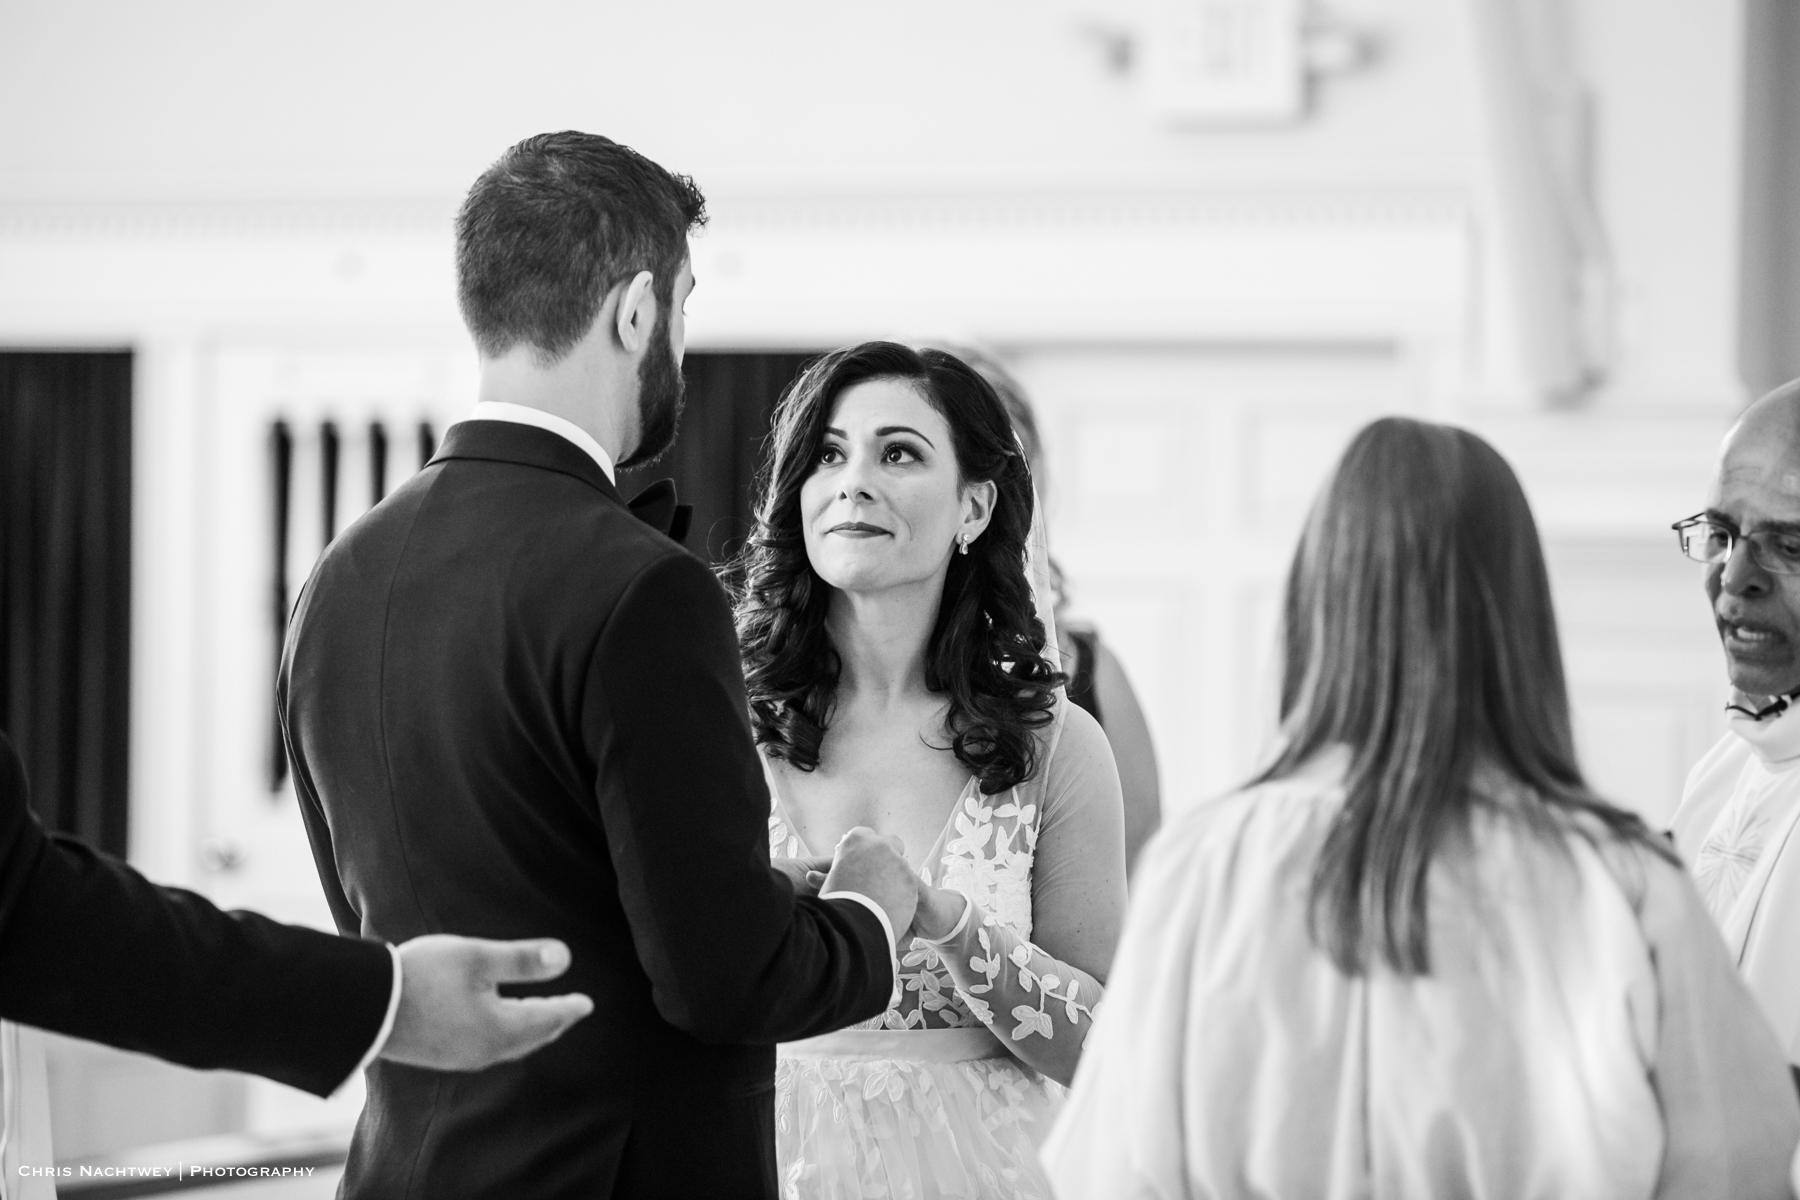 winter-branford-house-wedding-photos-groton-ct-chris-nachtwey-photography-2019-15.jpg